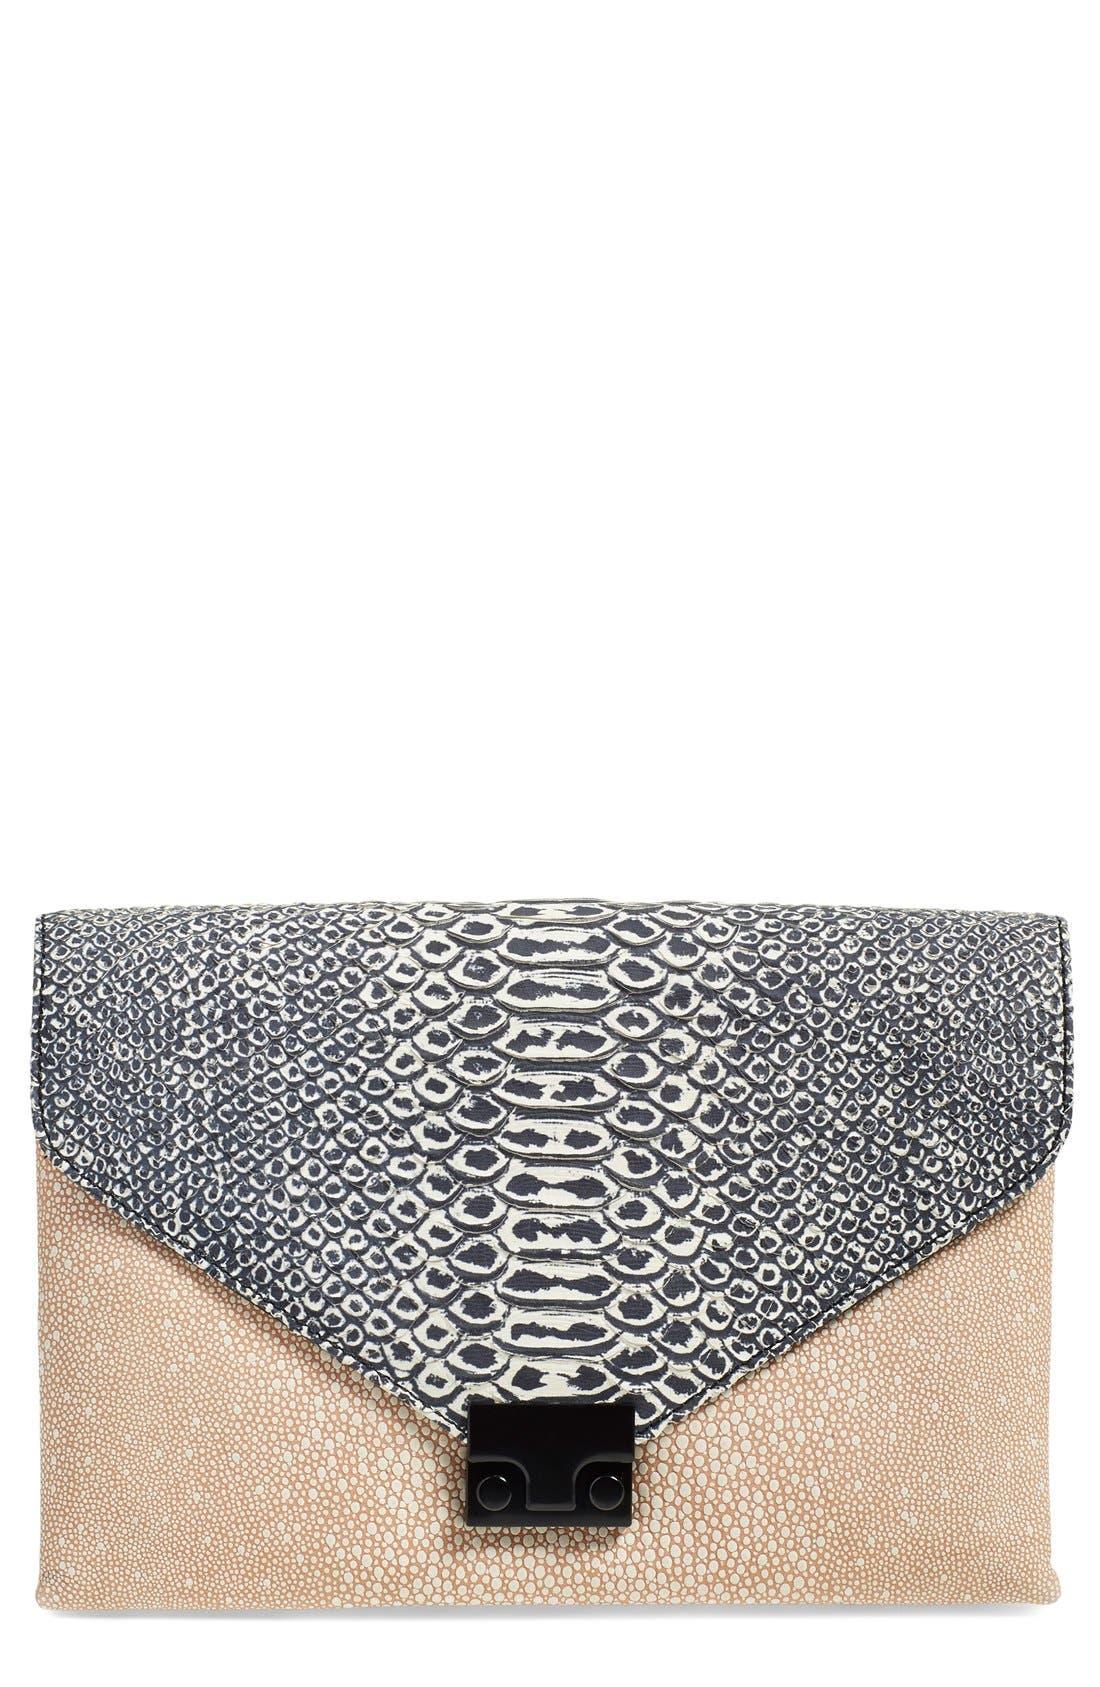 Alternate Image 1 Selected - Loeffler Randall 'Lock' Leather Envelope Clutch